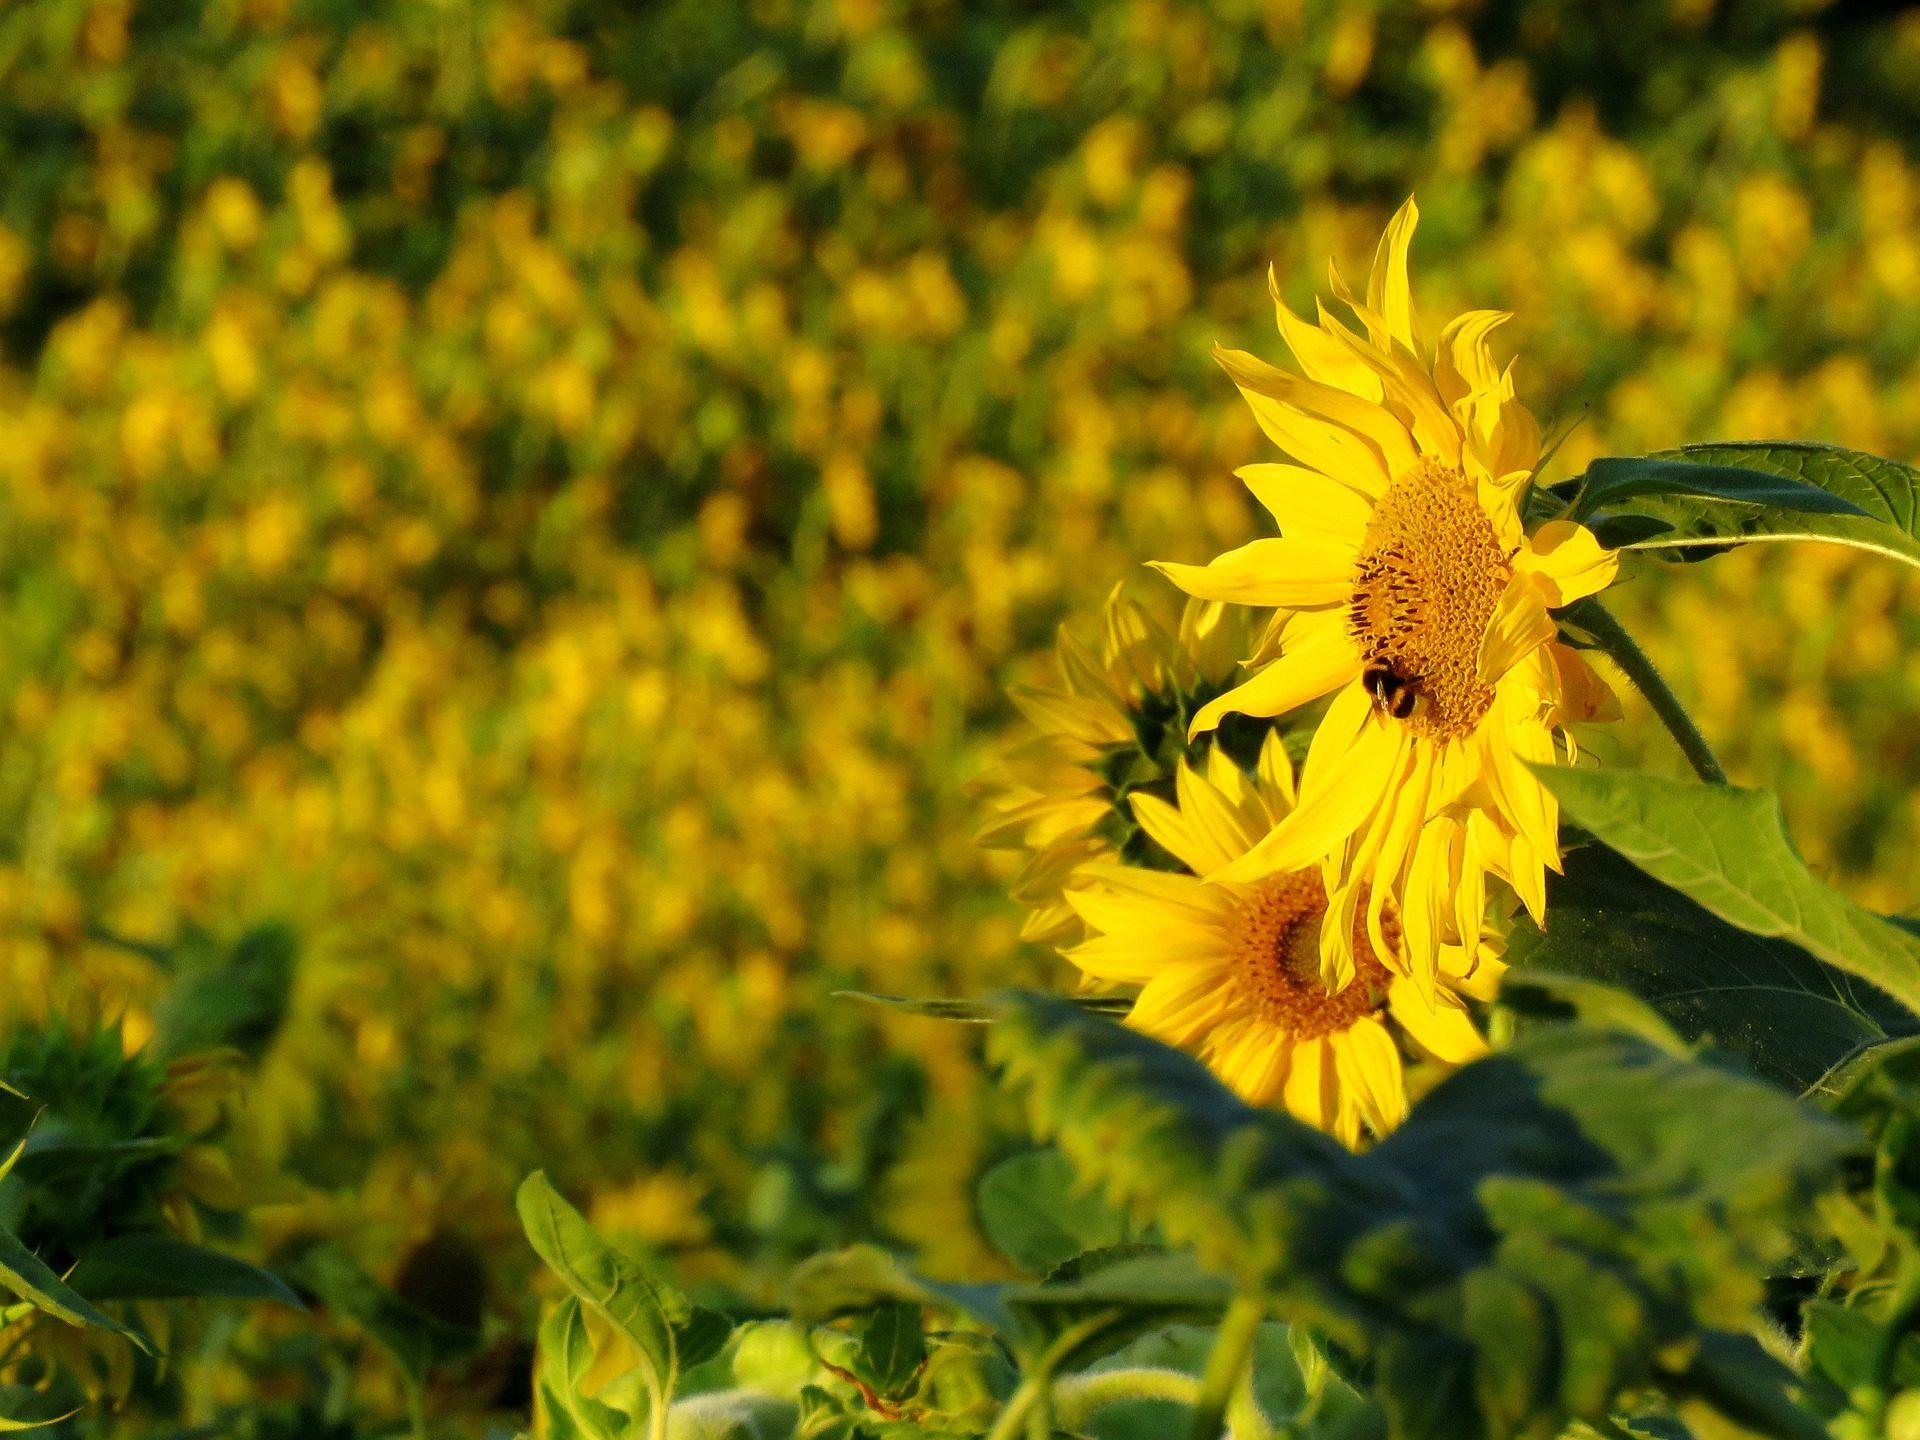 girasoles, flores, plantas, floración, campo, verano - Fondos de Pantalla HD - professor-falken.com